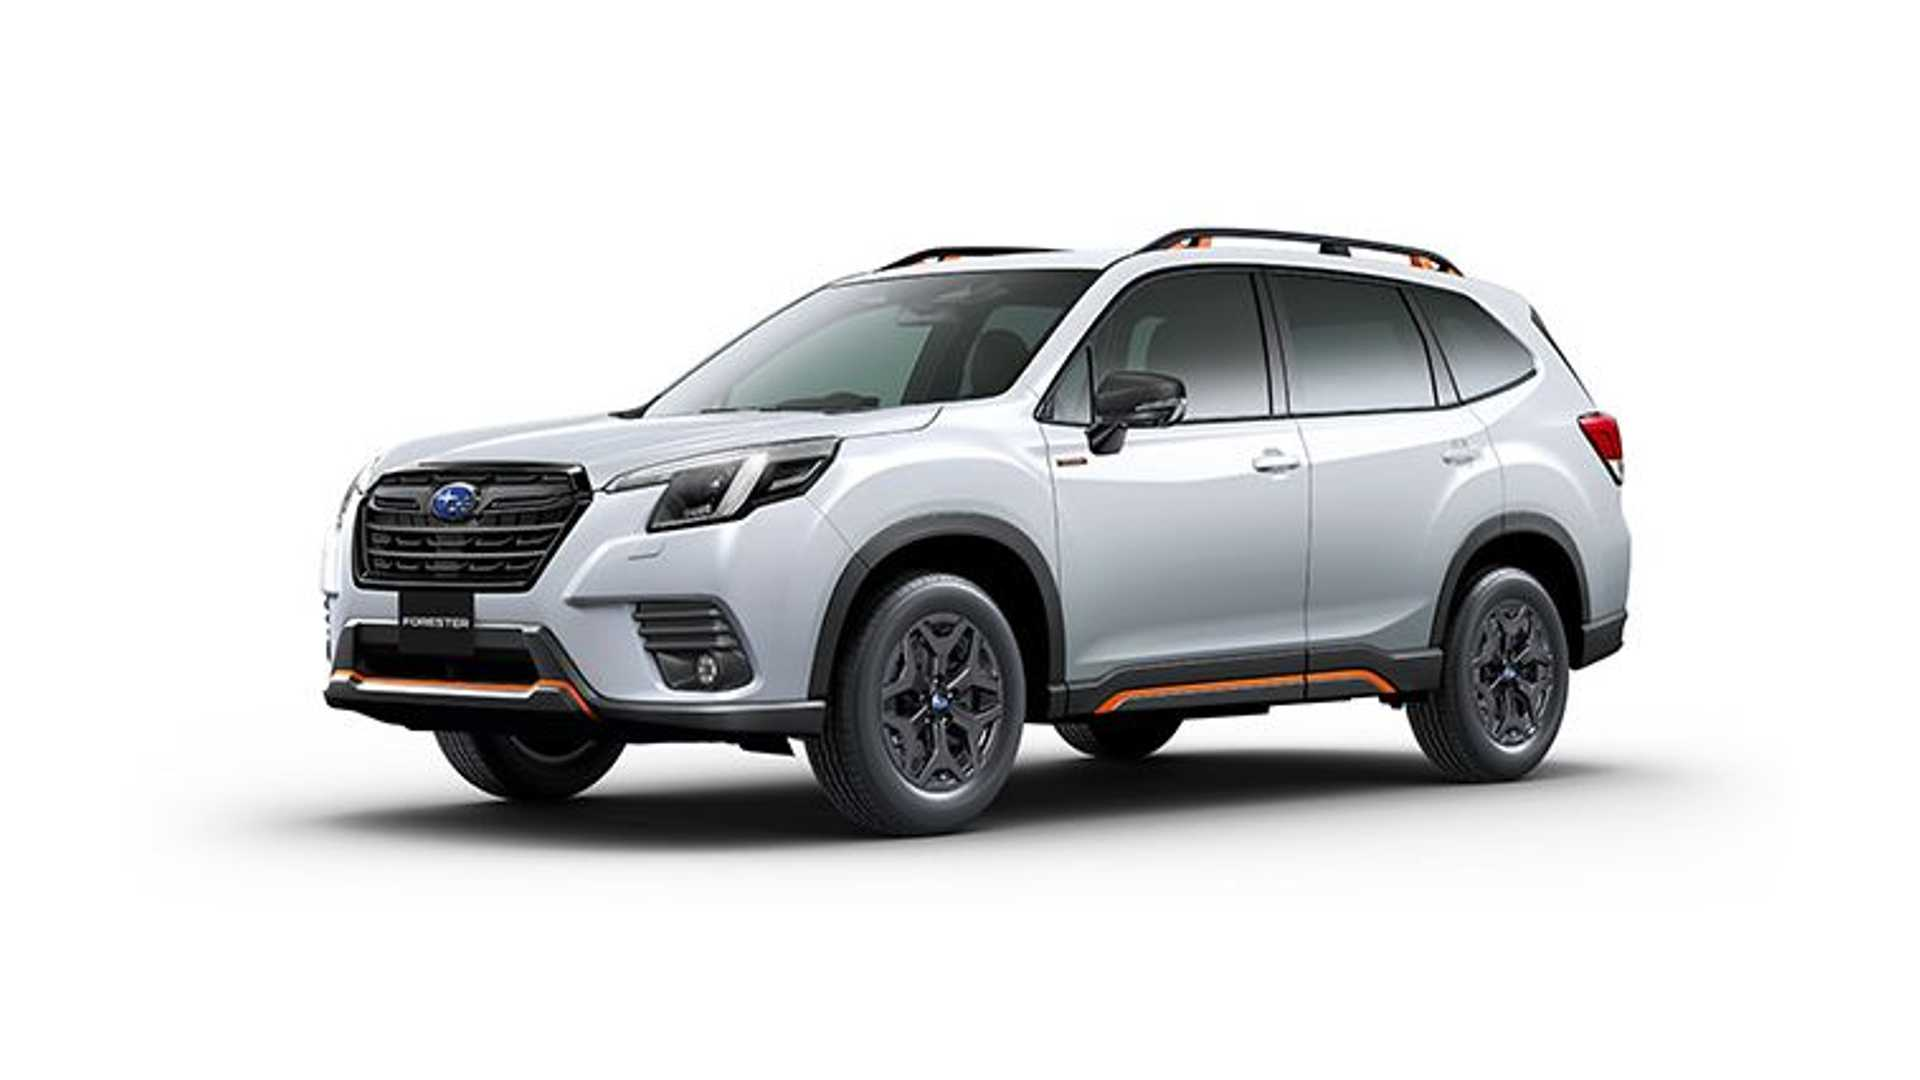 Subaru-Forester-facelift-8